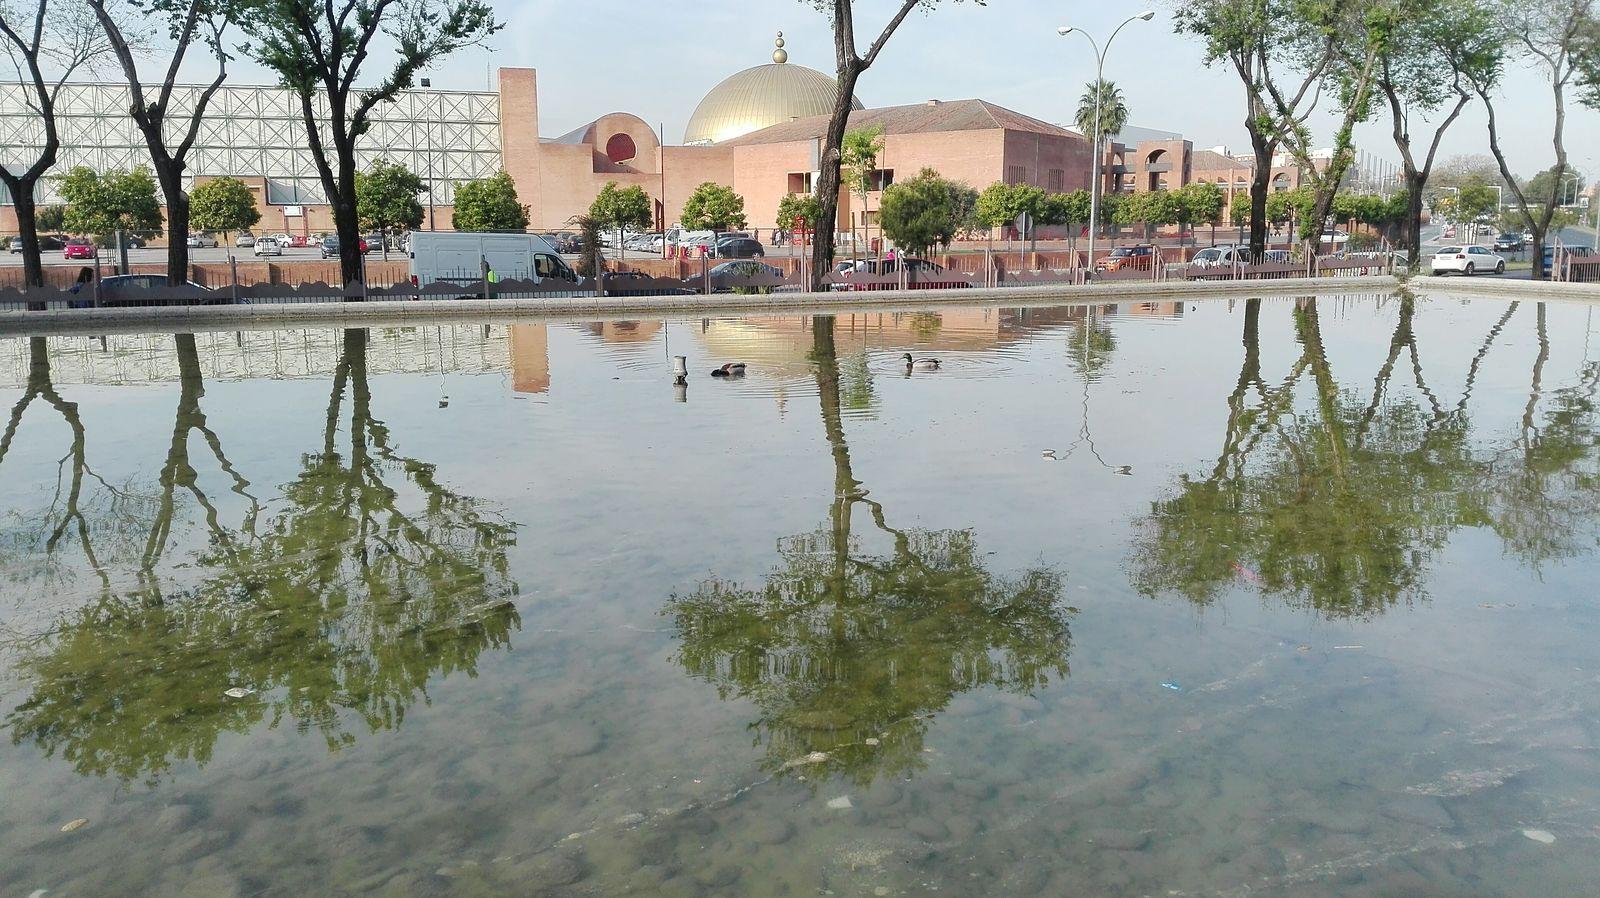 Hello World Patos A La Vista Taking Photos Enjoying Life Streetphotography Mi Ciudad My Town Hello World España🇪🇸 Si Es Sevilla